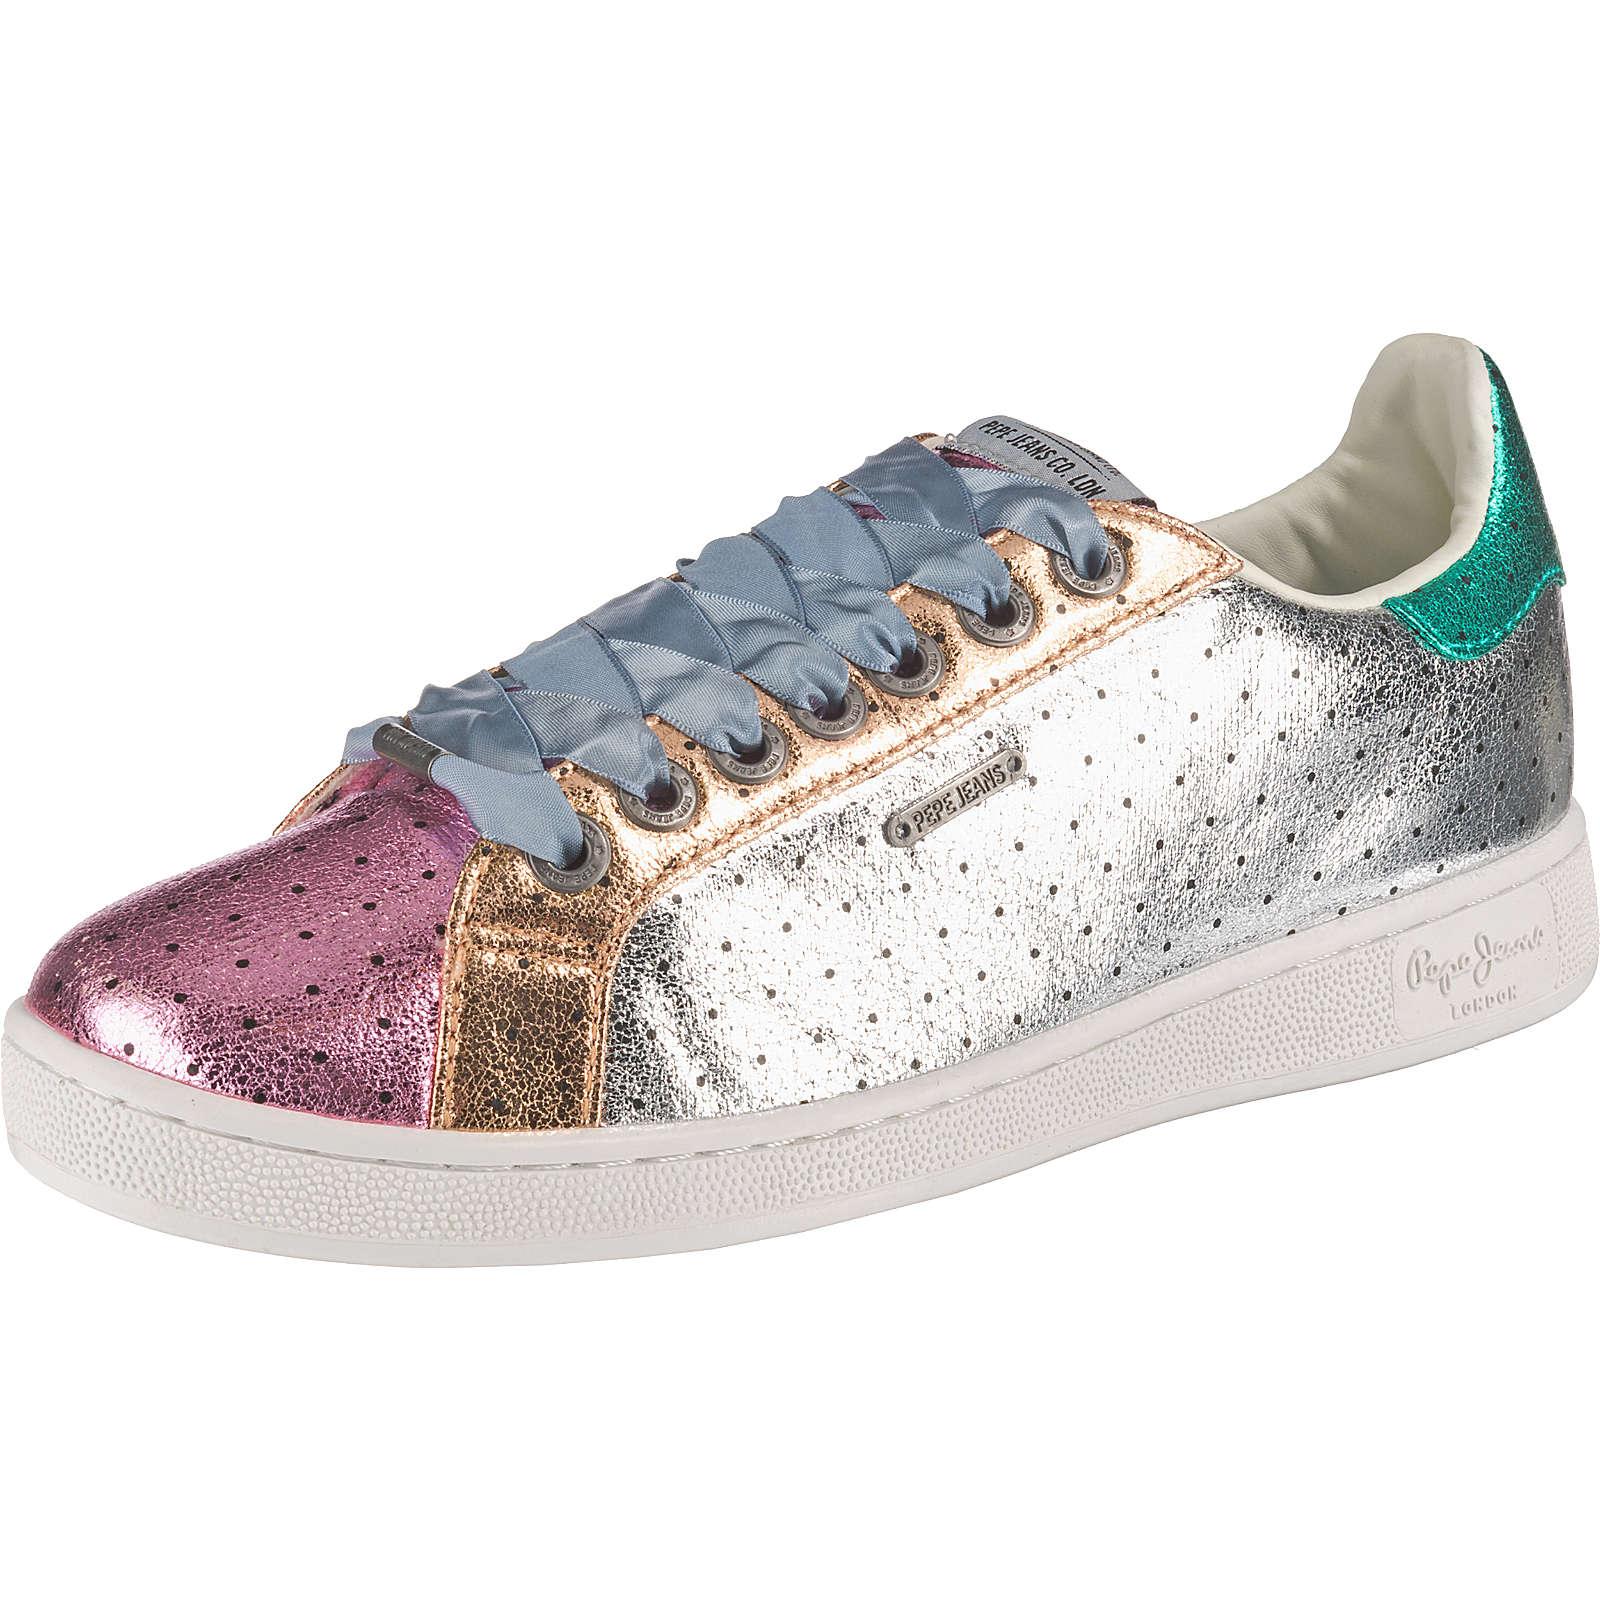 Pepe Jeans Sneakers Low bunt Damen Gr. 36